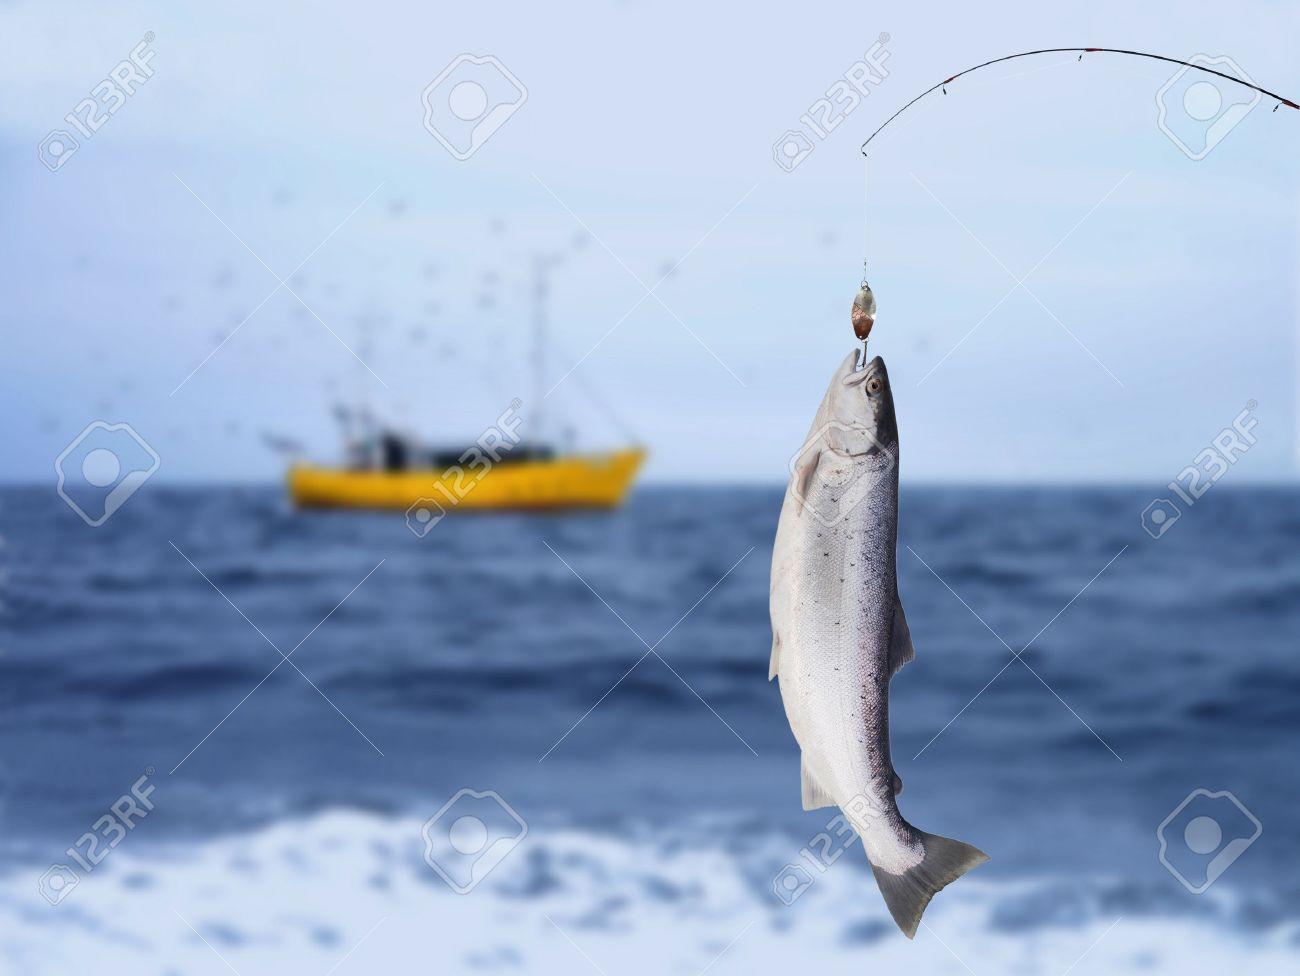 salmon on fishing-rod on background of sea - 17389304